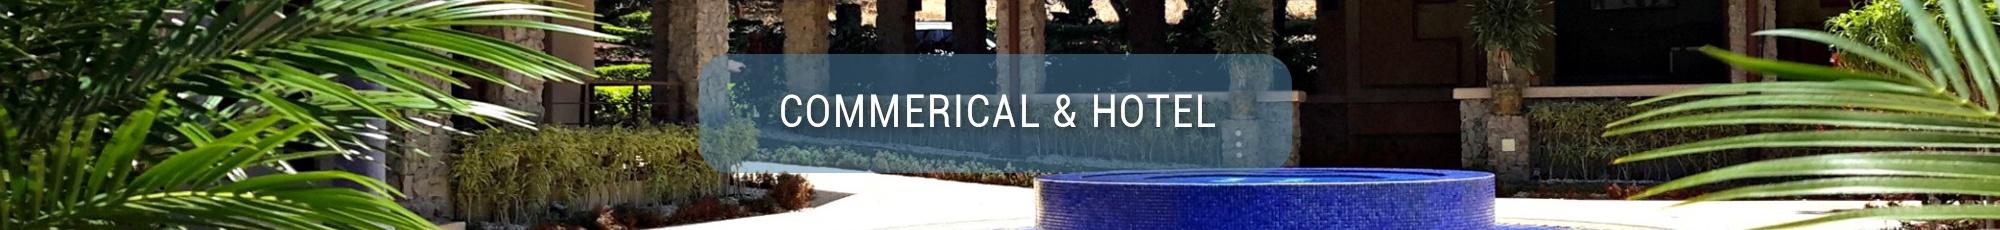 Commercial & Hotel Banner